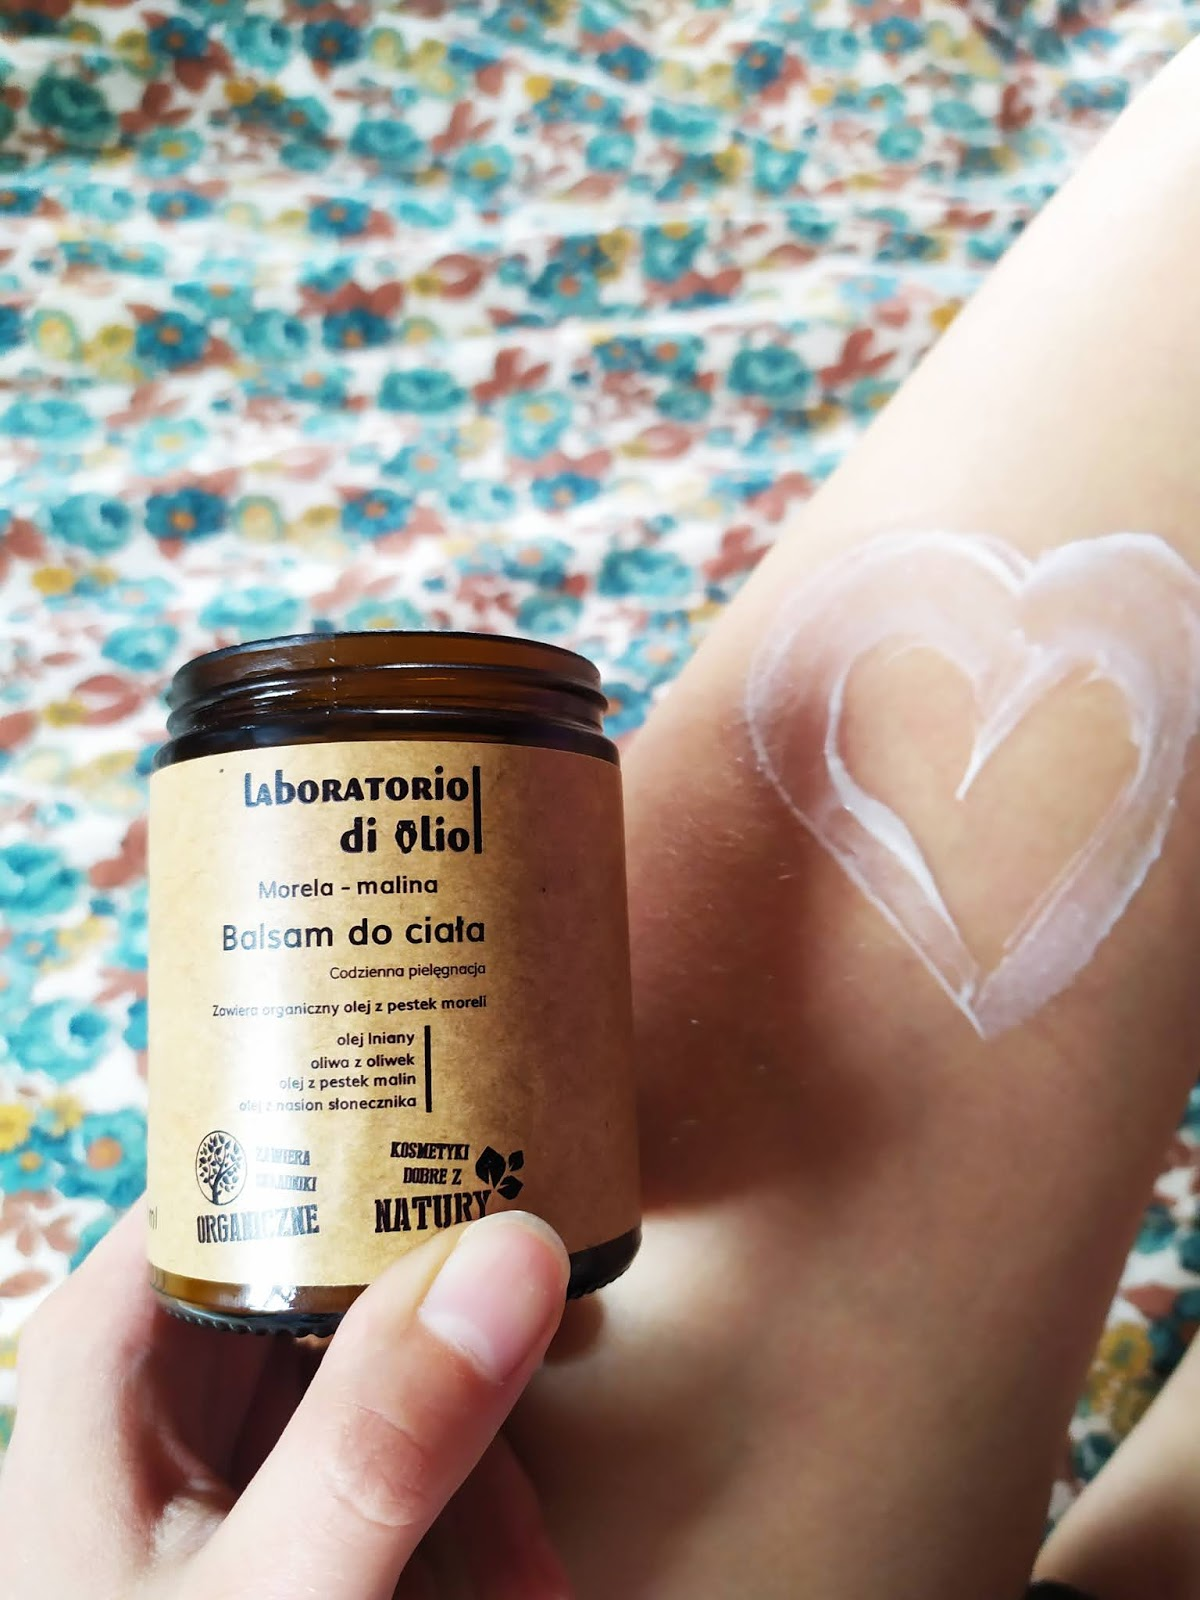 Recenzja - Laboratorio di olio Balsam do ciała morela malina